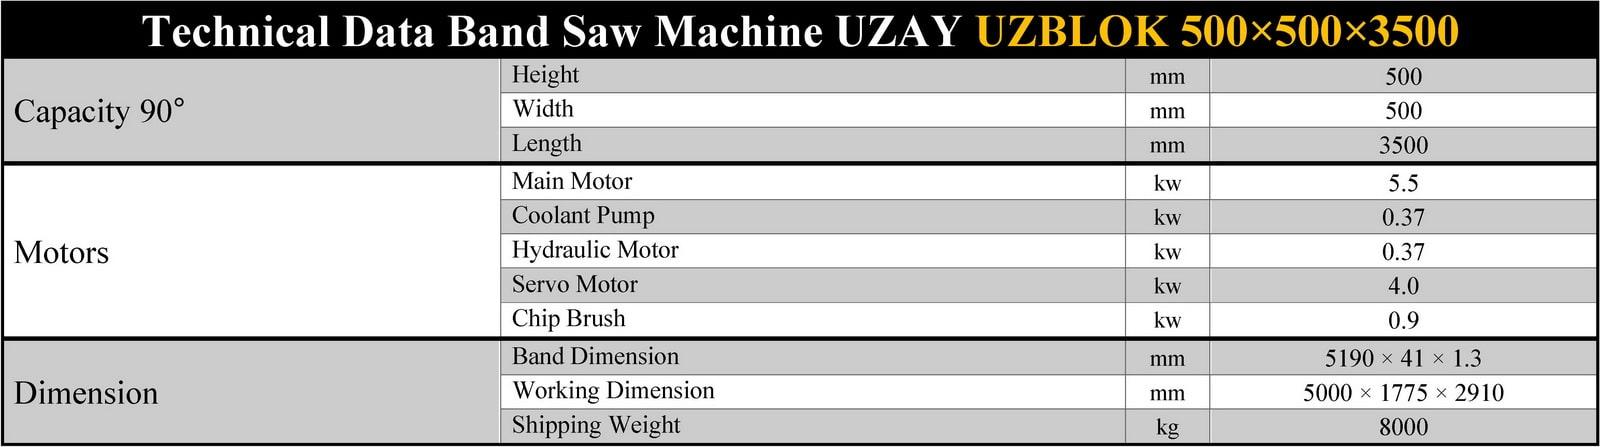 Uzay UZBLOK - مشخصات فنی دستگاه اره نواری عمود بر برش فلز اوزای